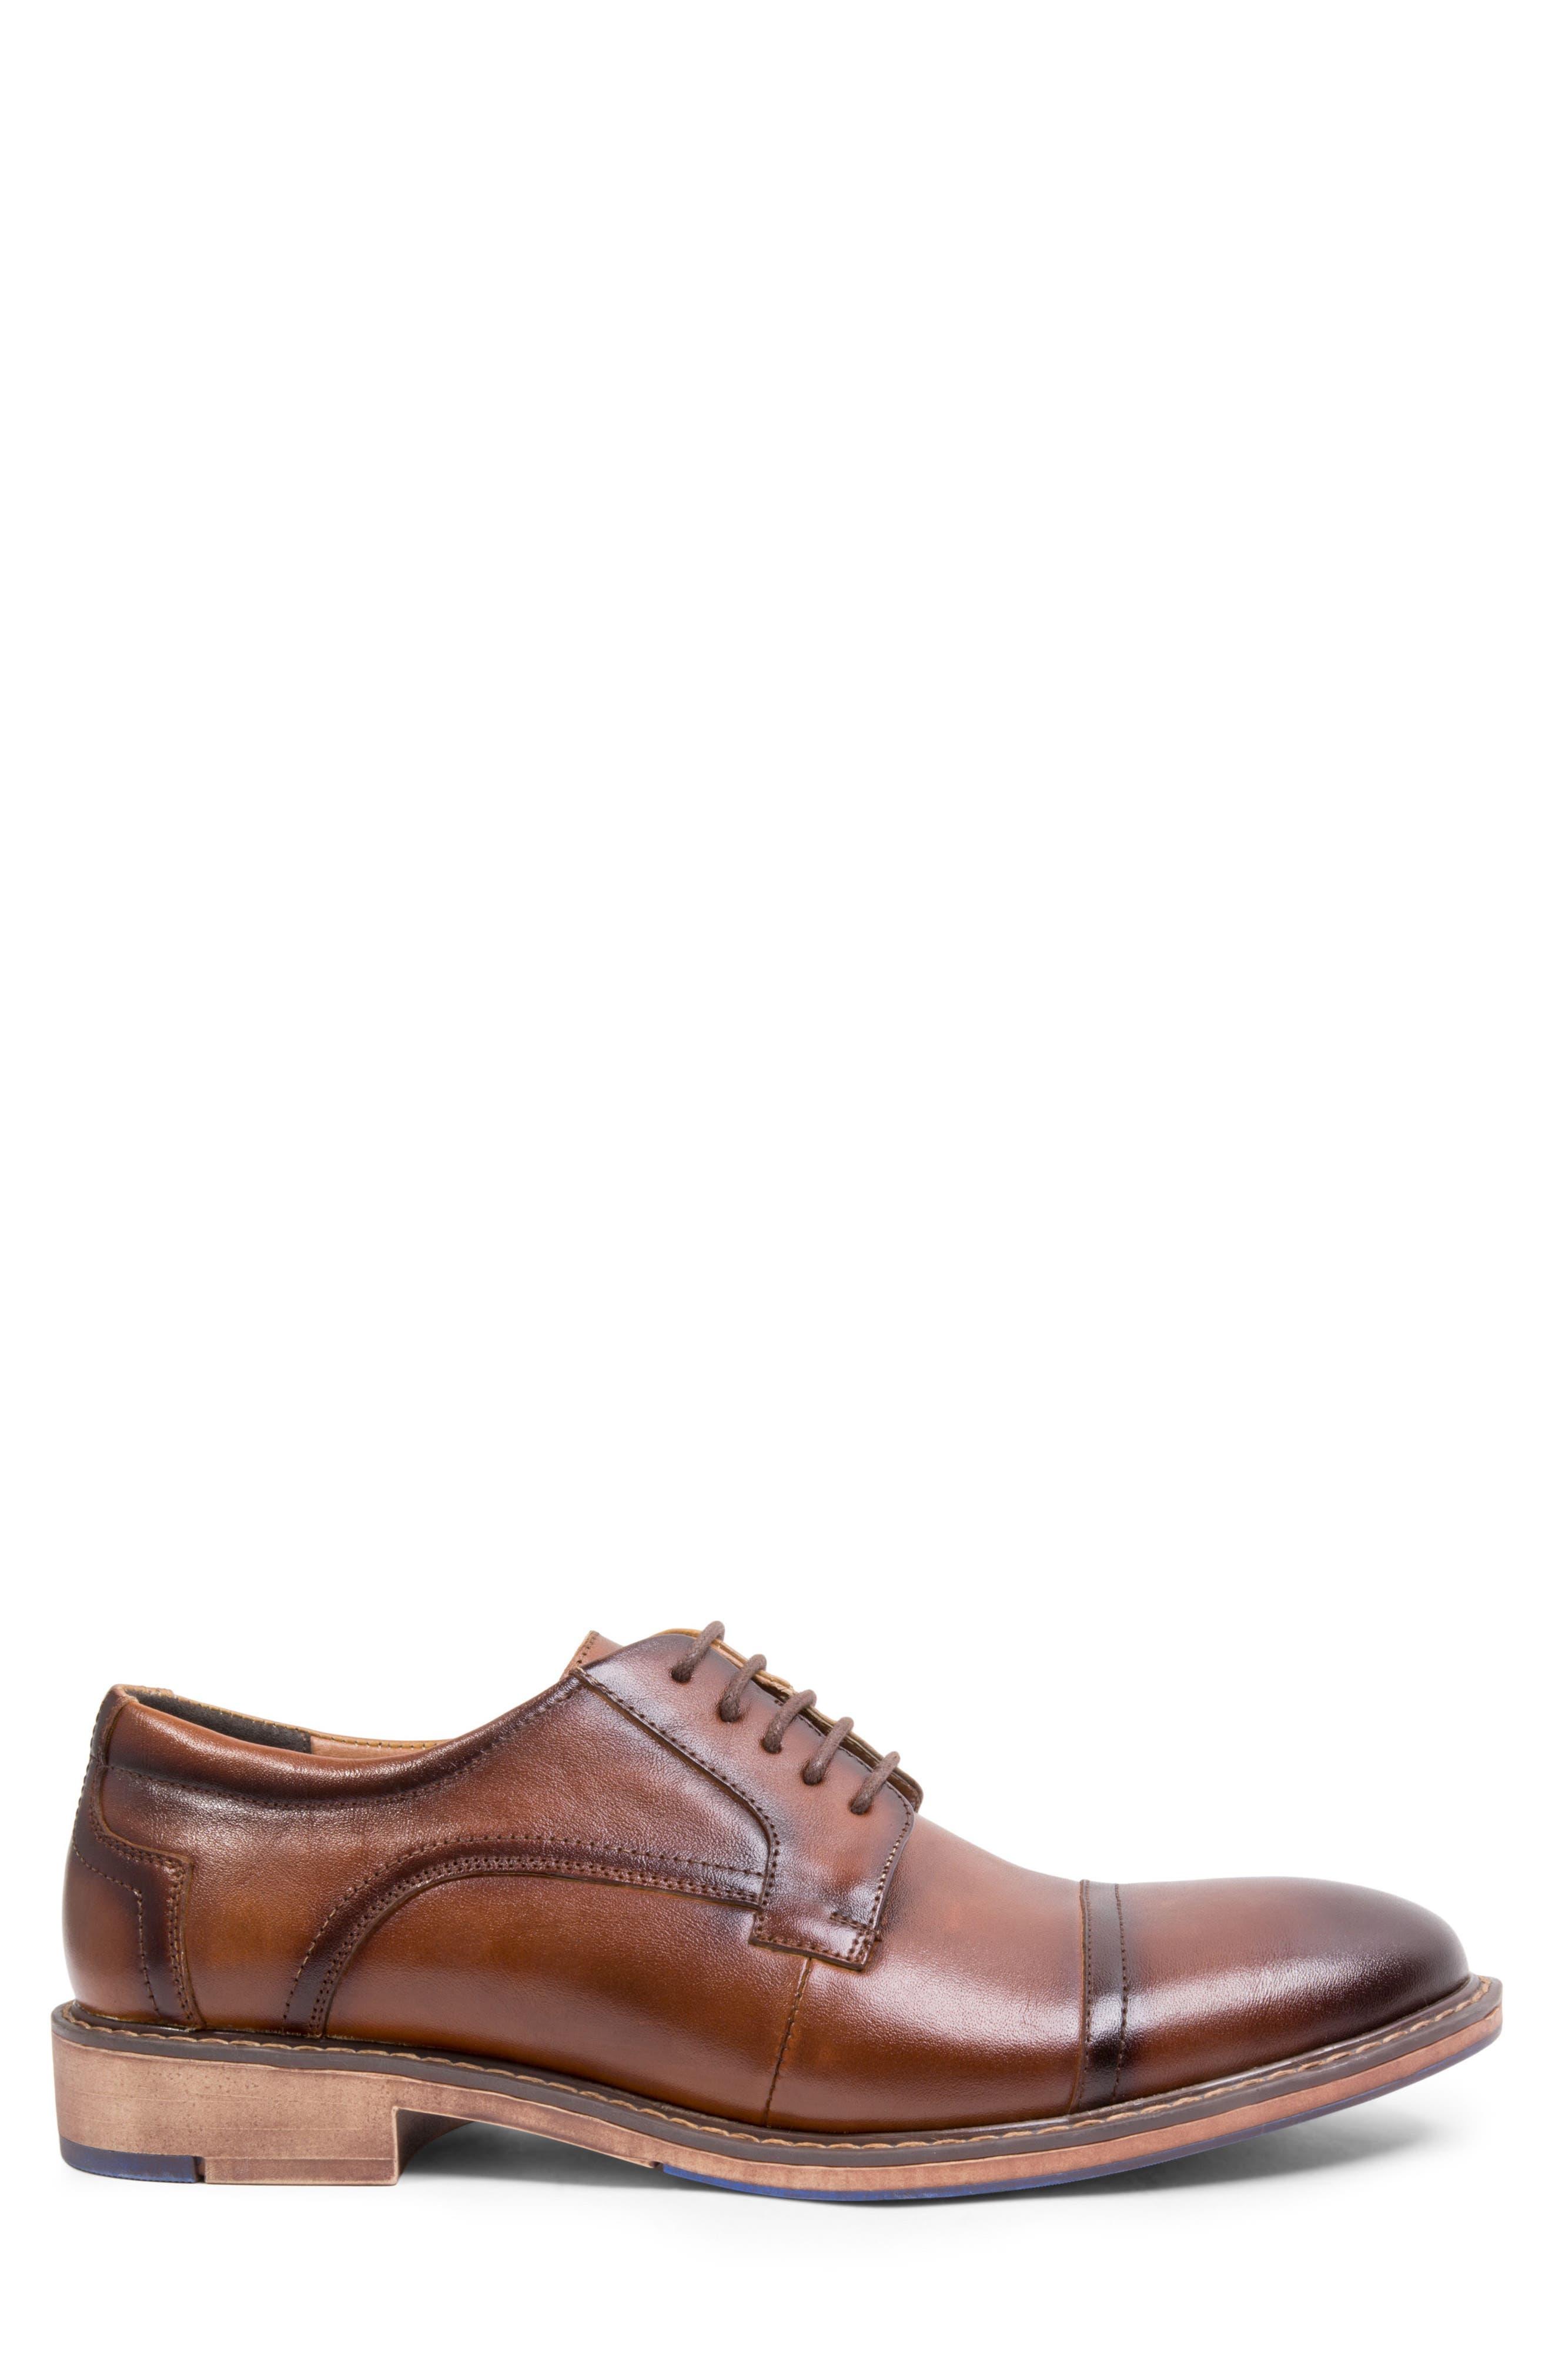 Averie Cap Toe Derby,                             Alternate thumbnail 3, color,                             Tan Leather